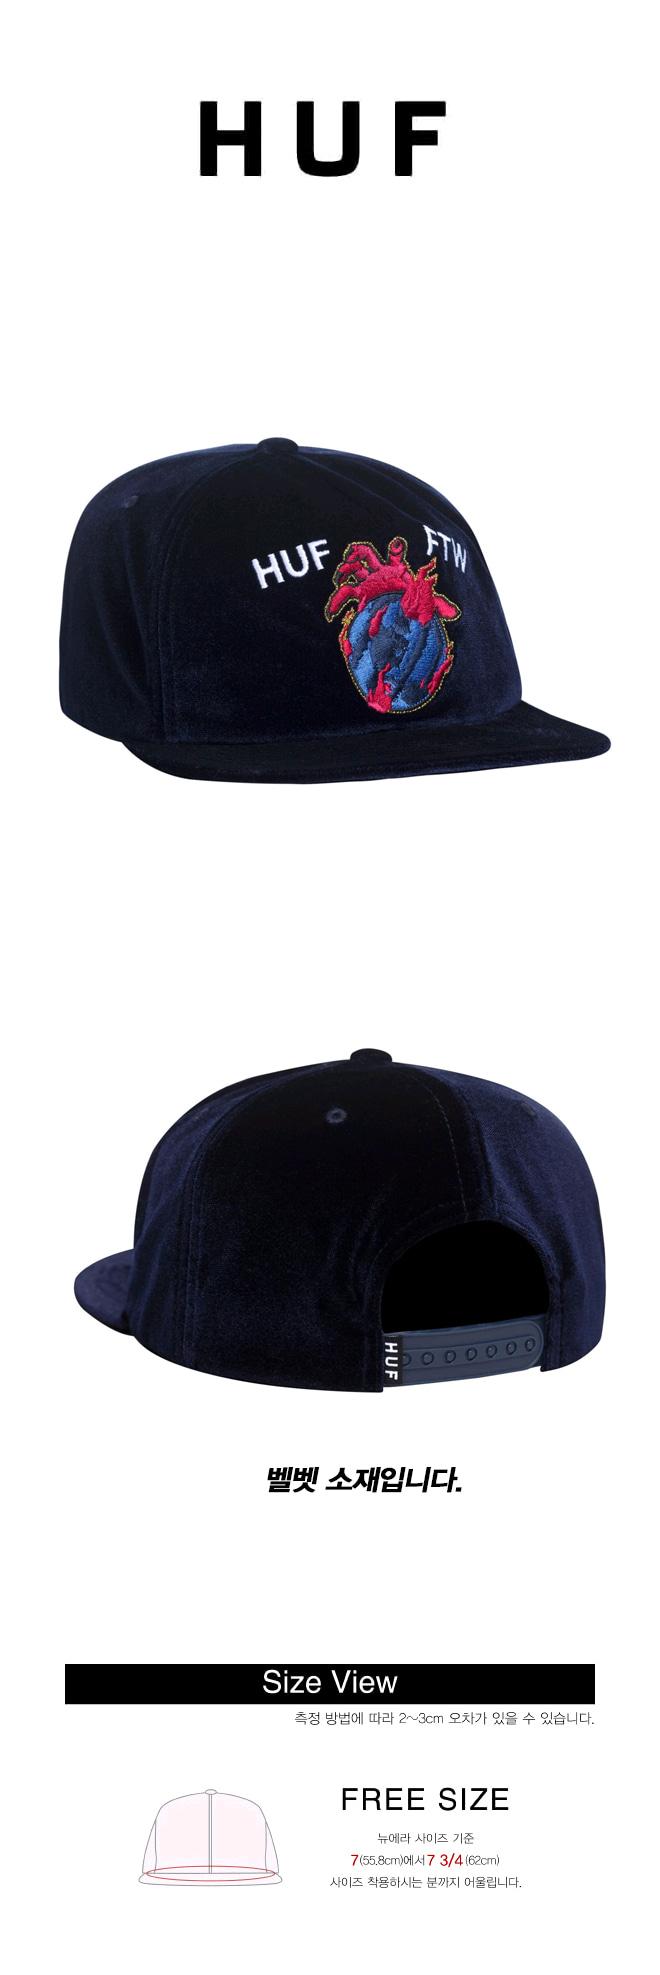 HUF PRESIDENTIAL SNAPBACK HAT